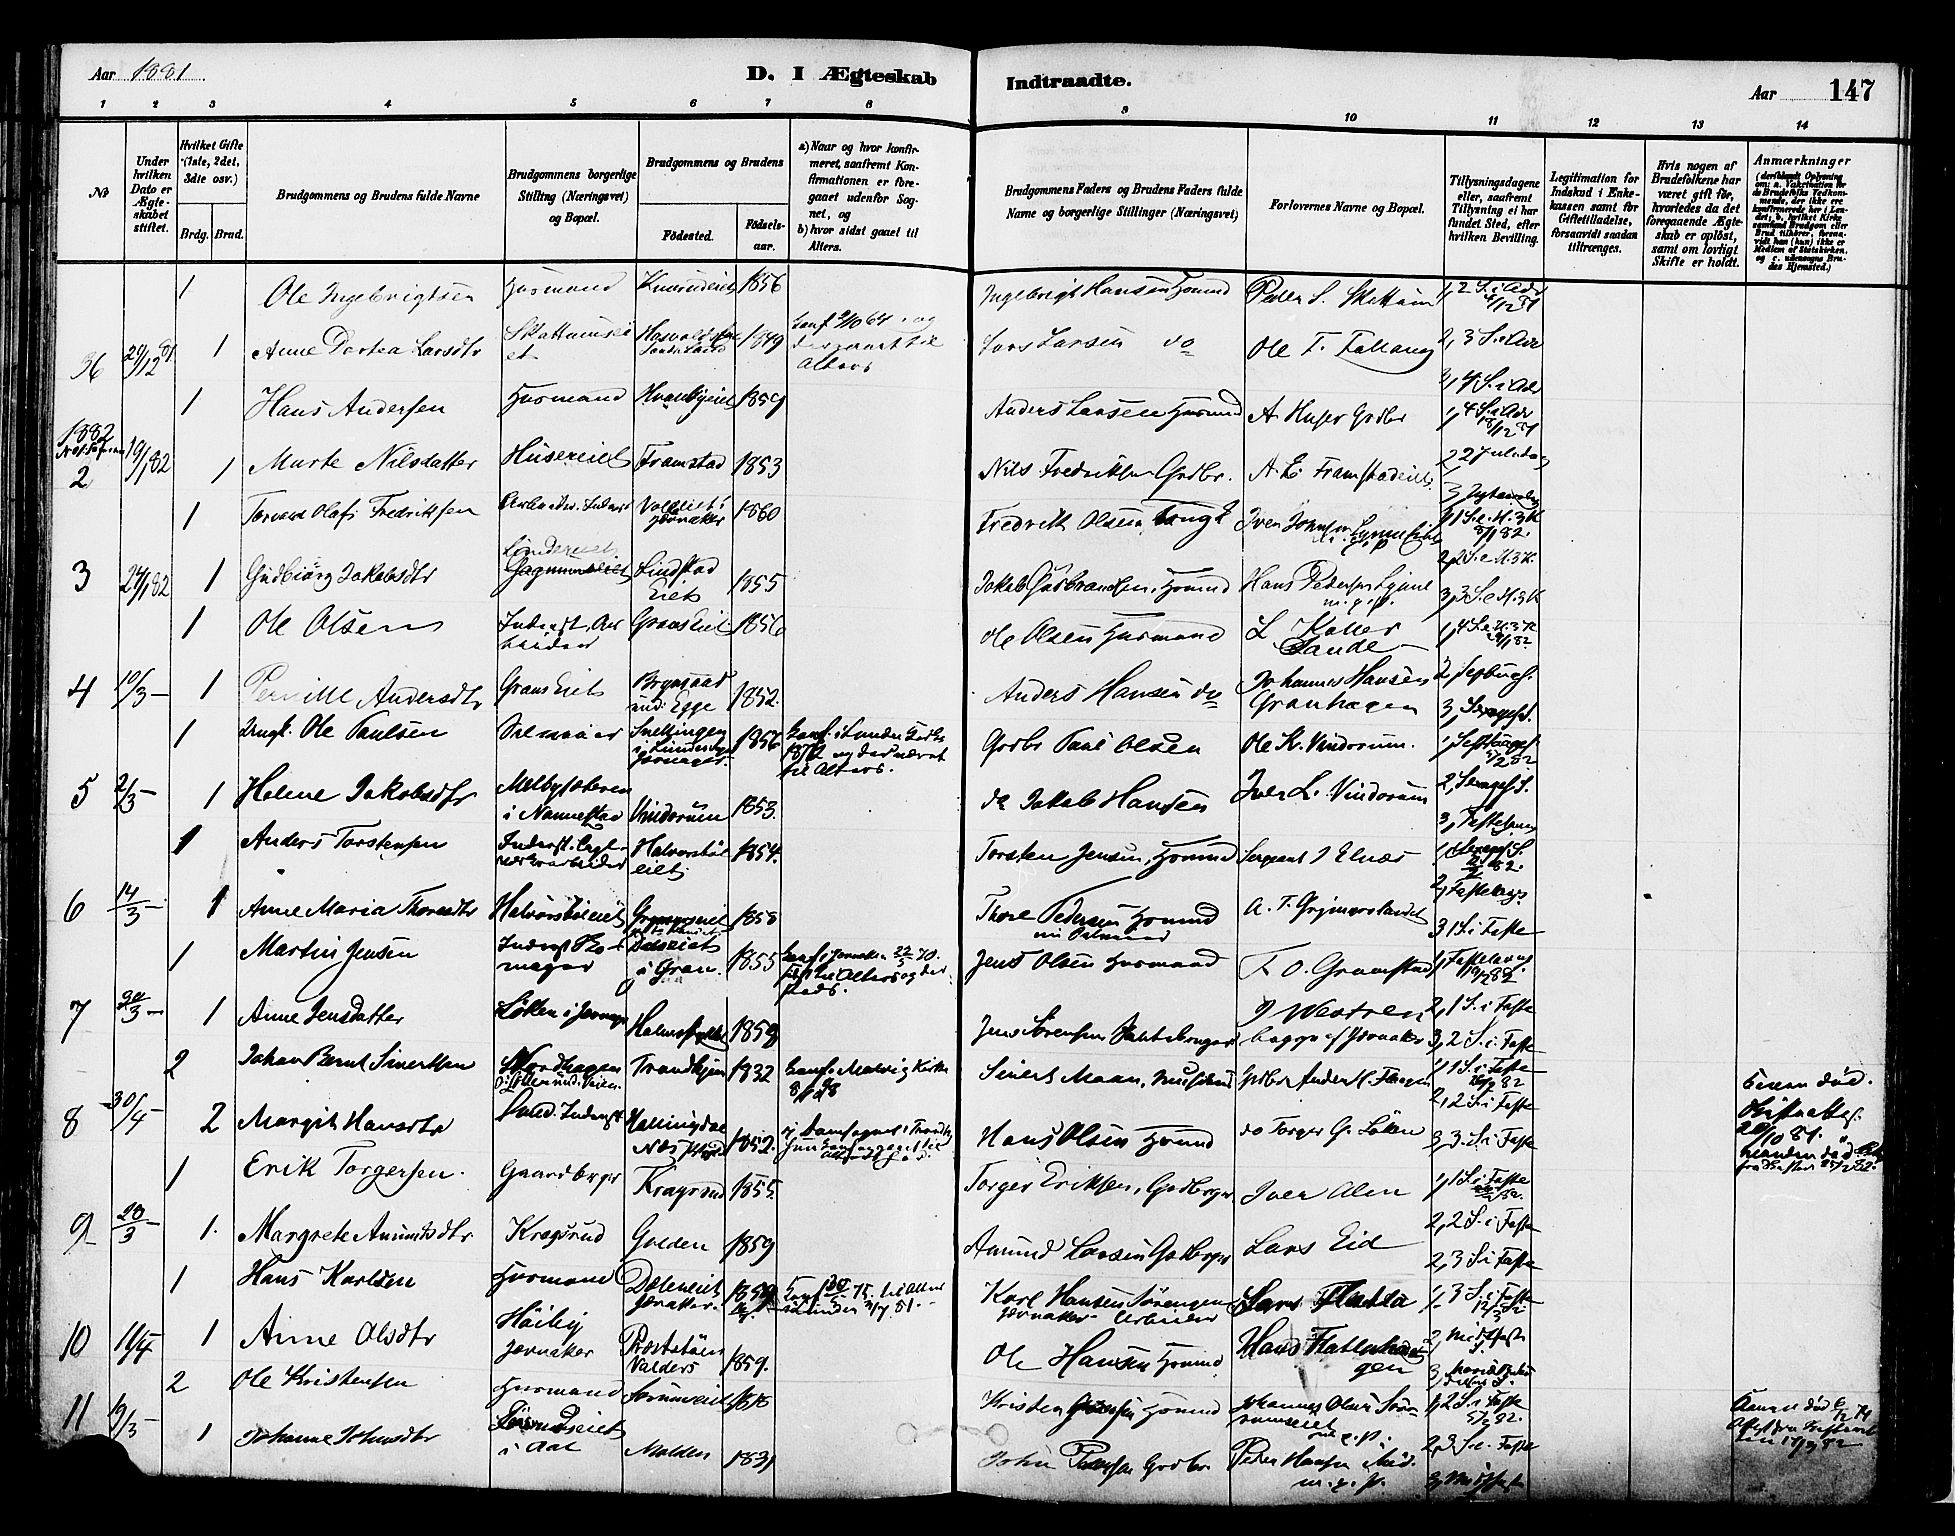 SAH, Gran prestekontor, Ministerialbok nr. 14, 1880-1889, s. 147